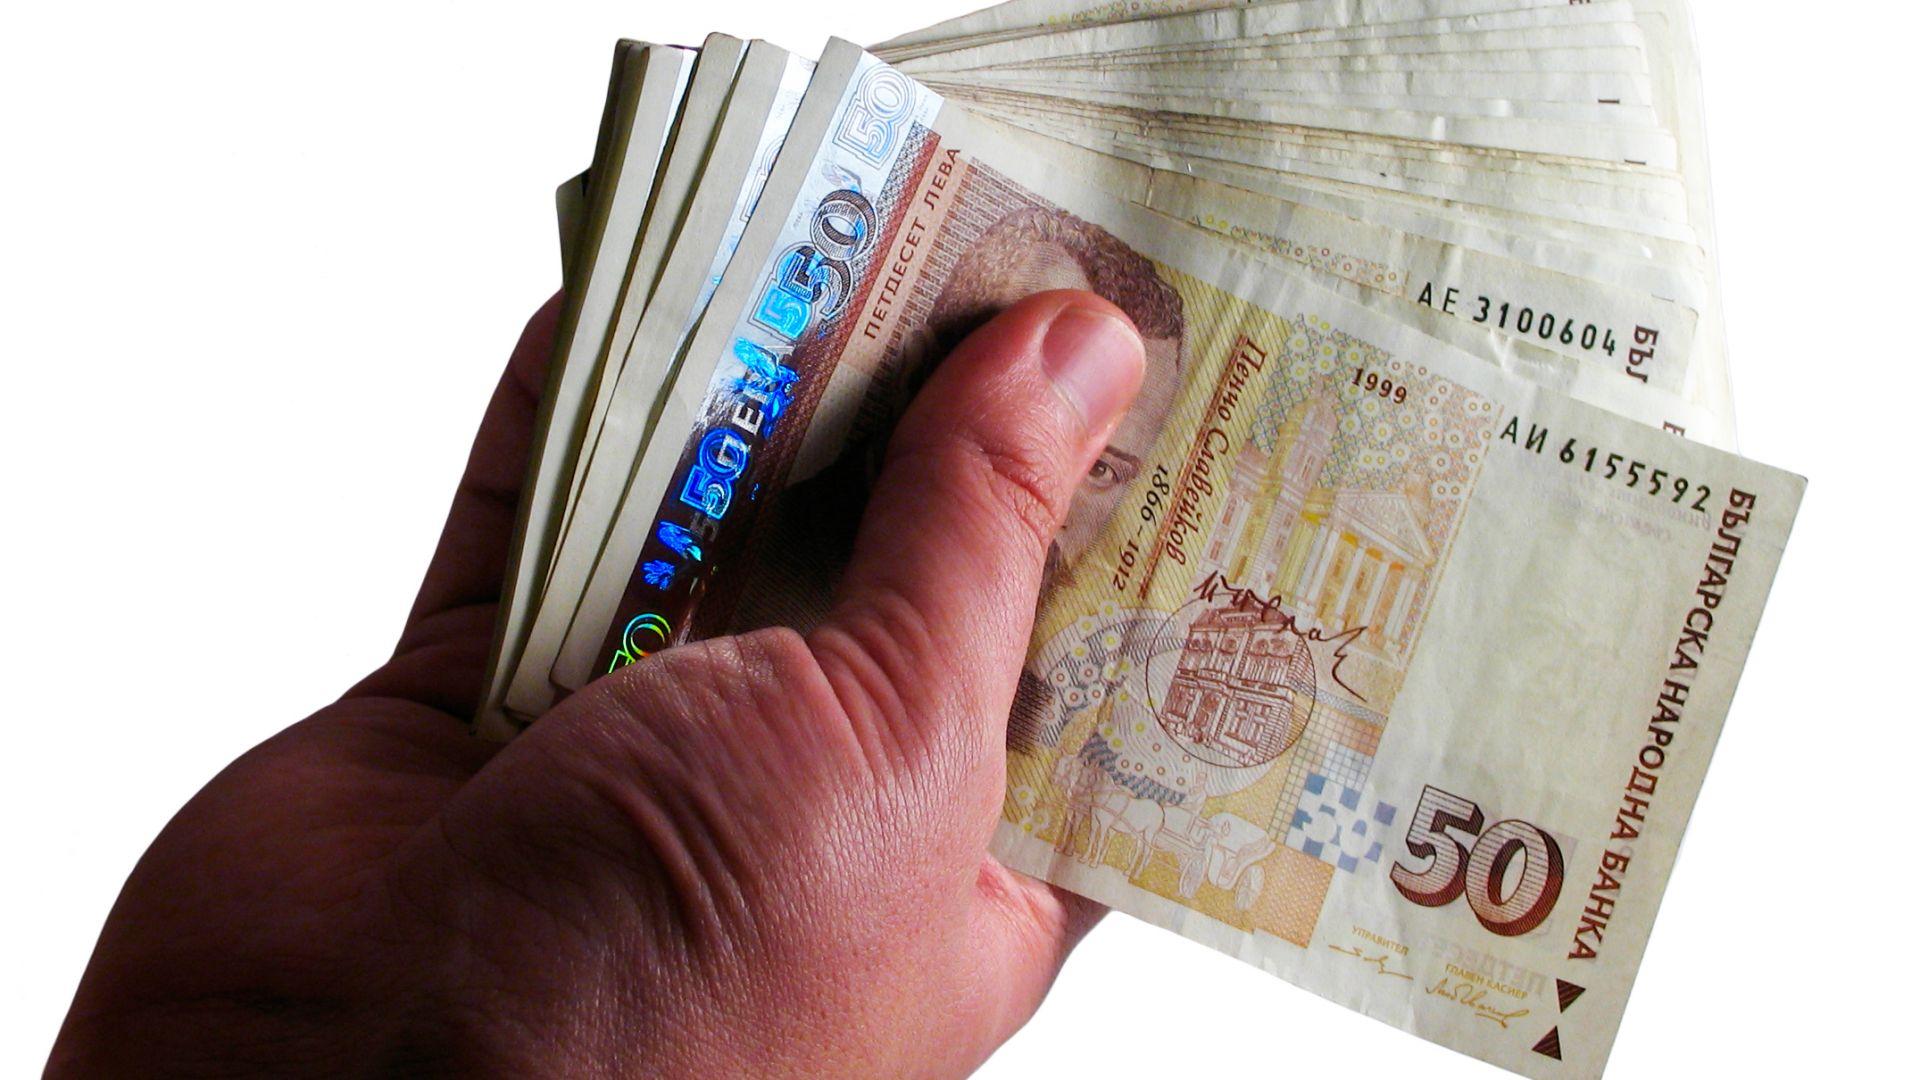 Бум на малките кредити и рекордна година за колекторските фирми